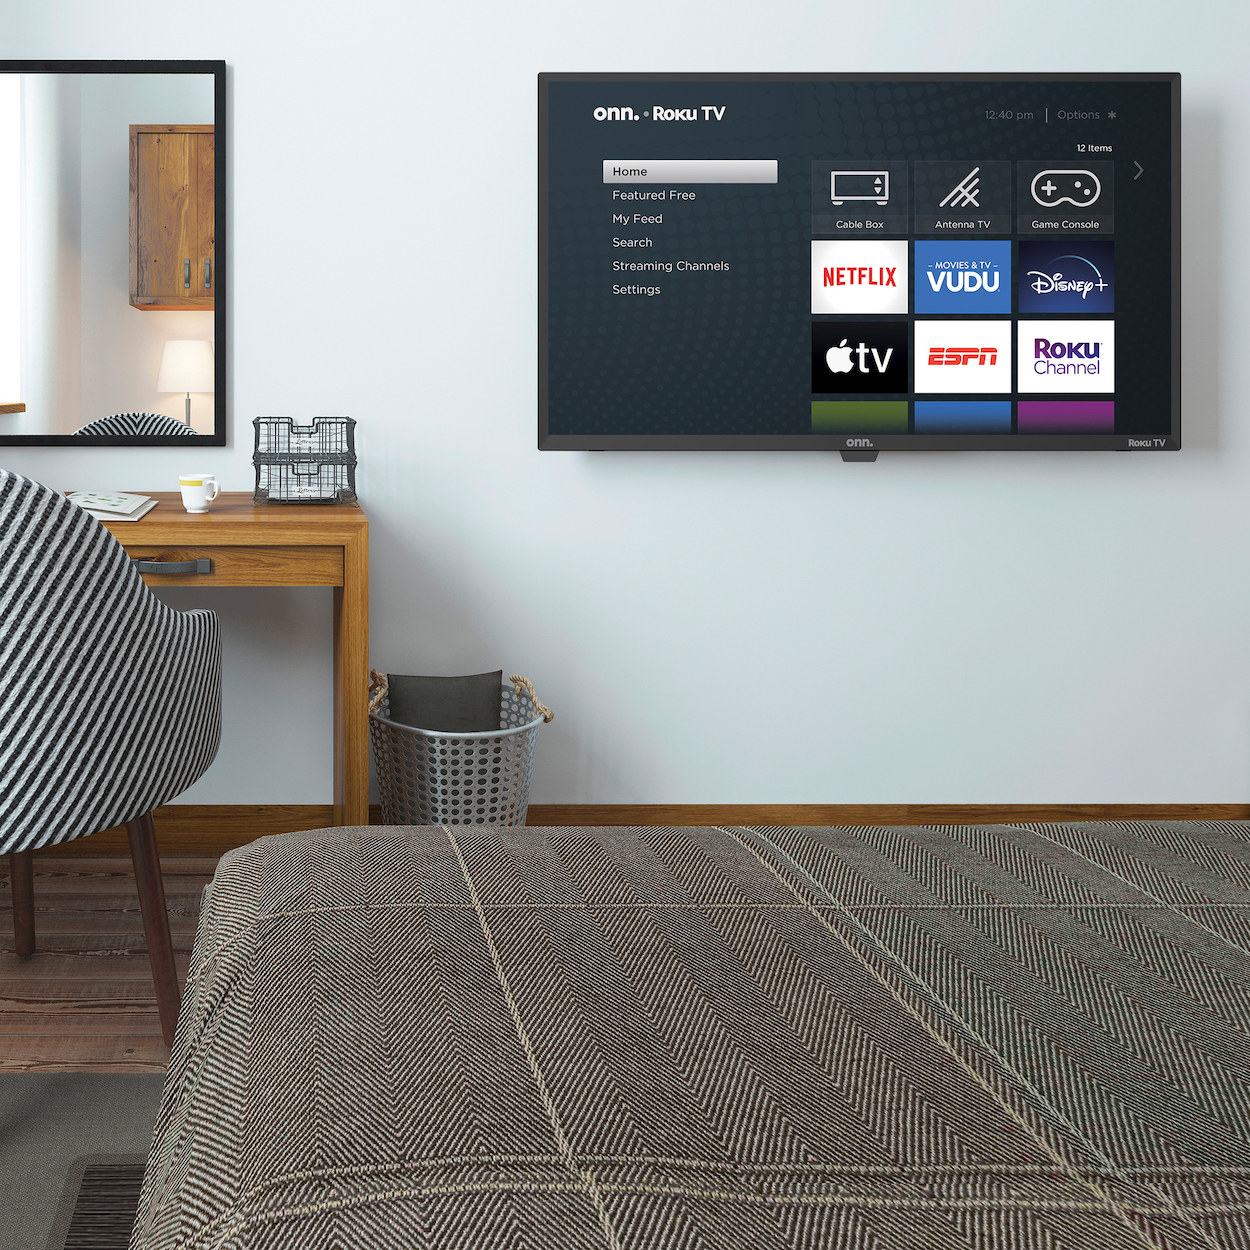 The flat screen TV